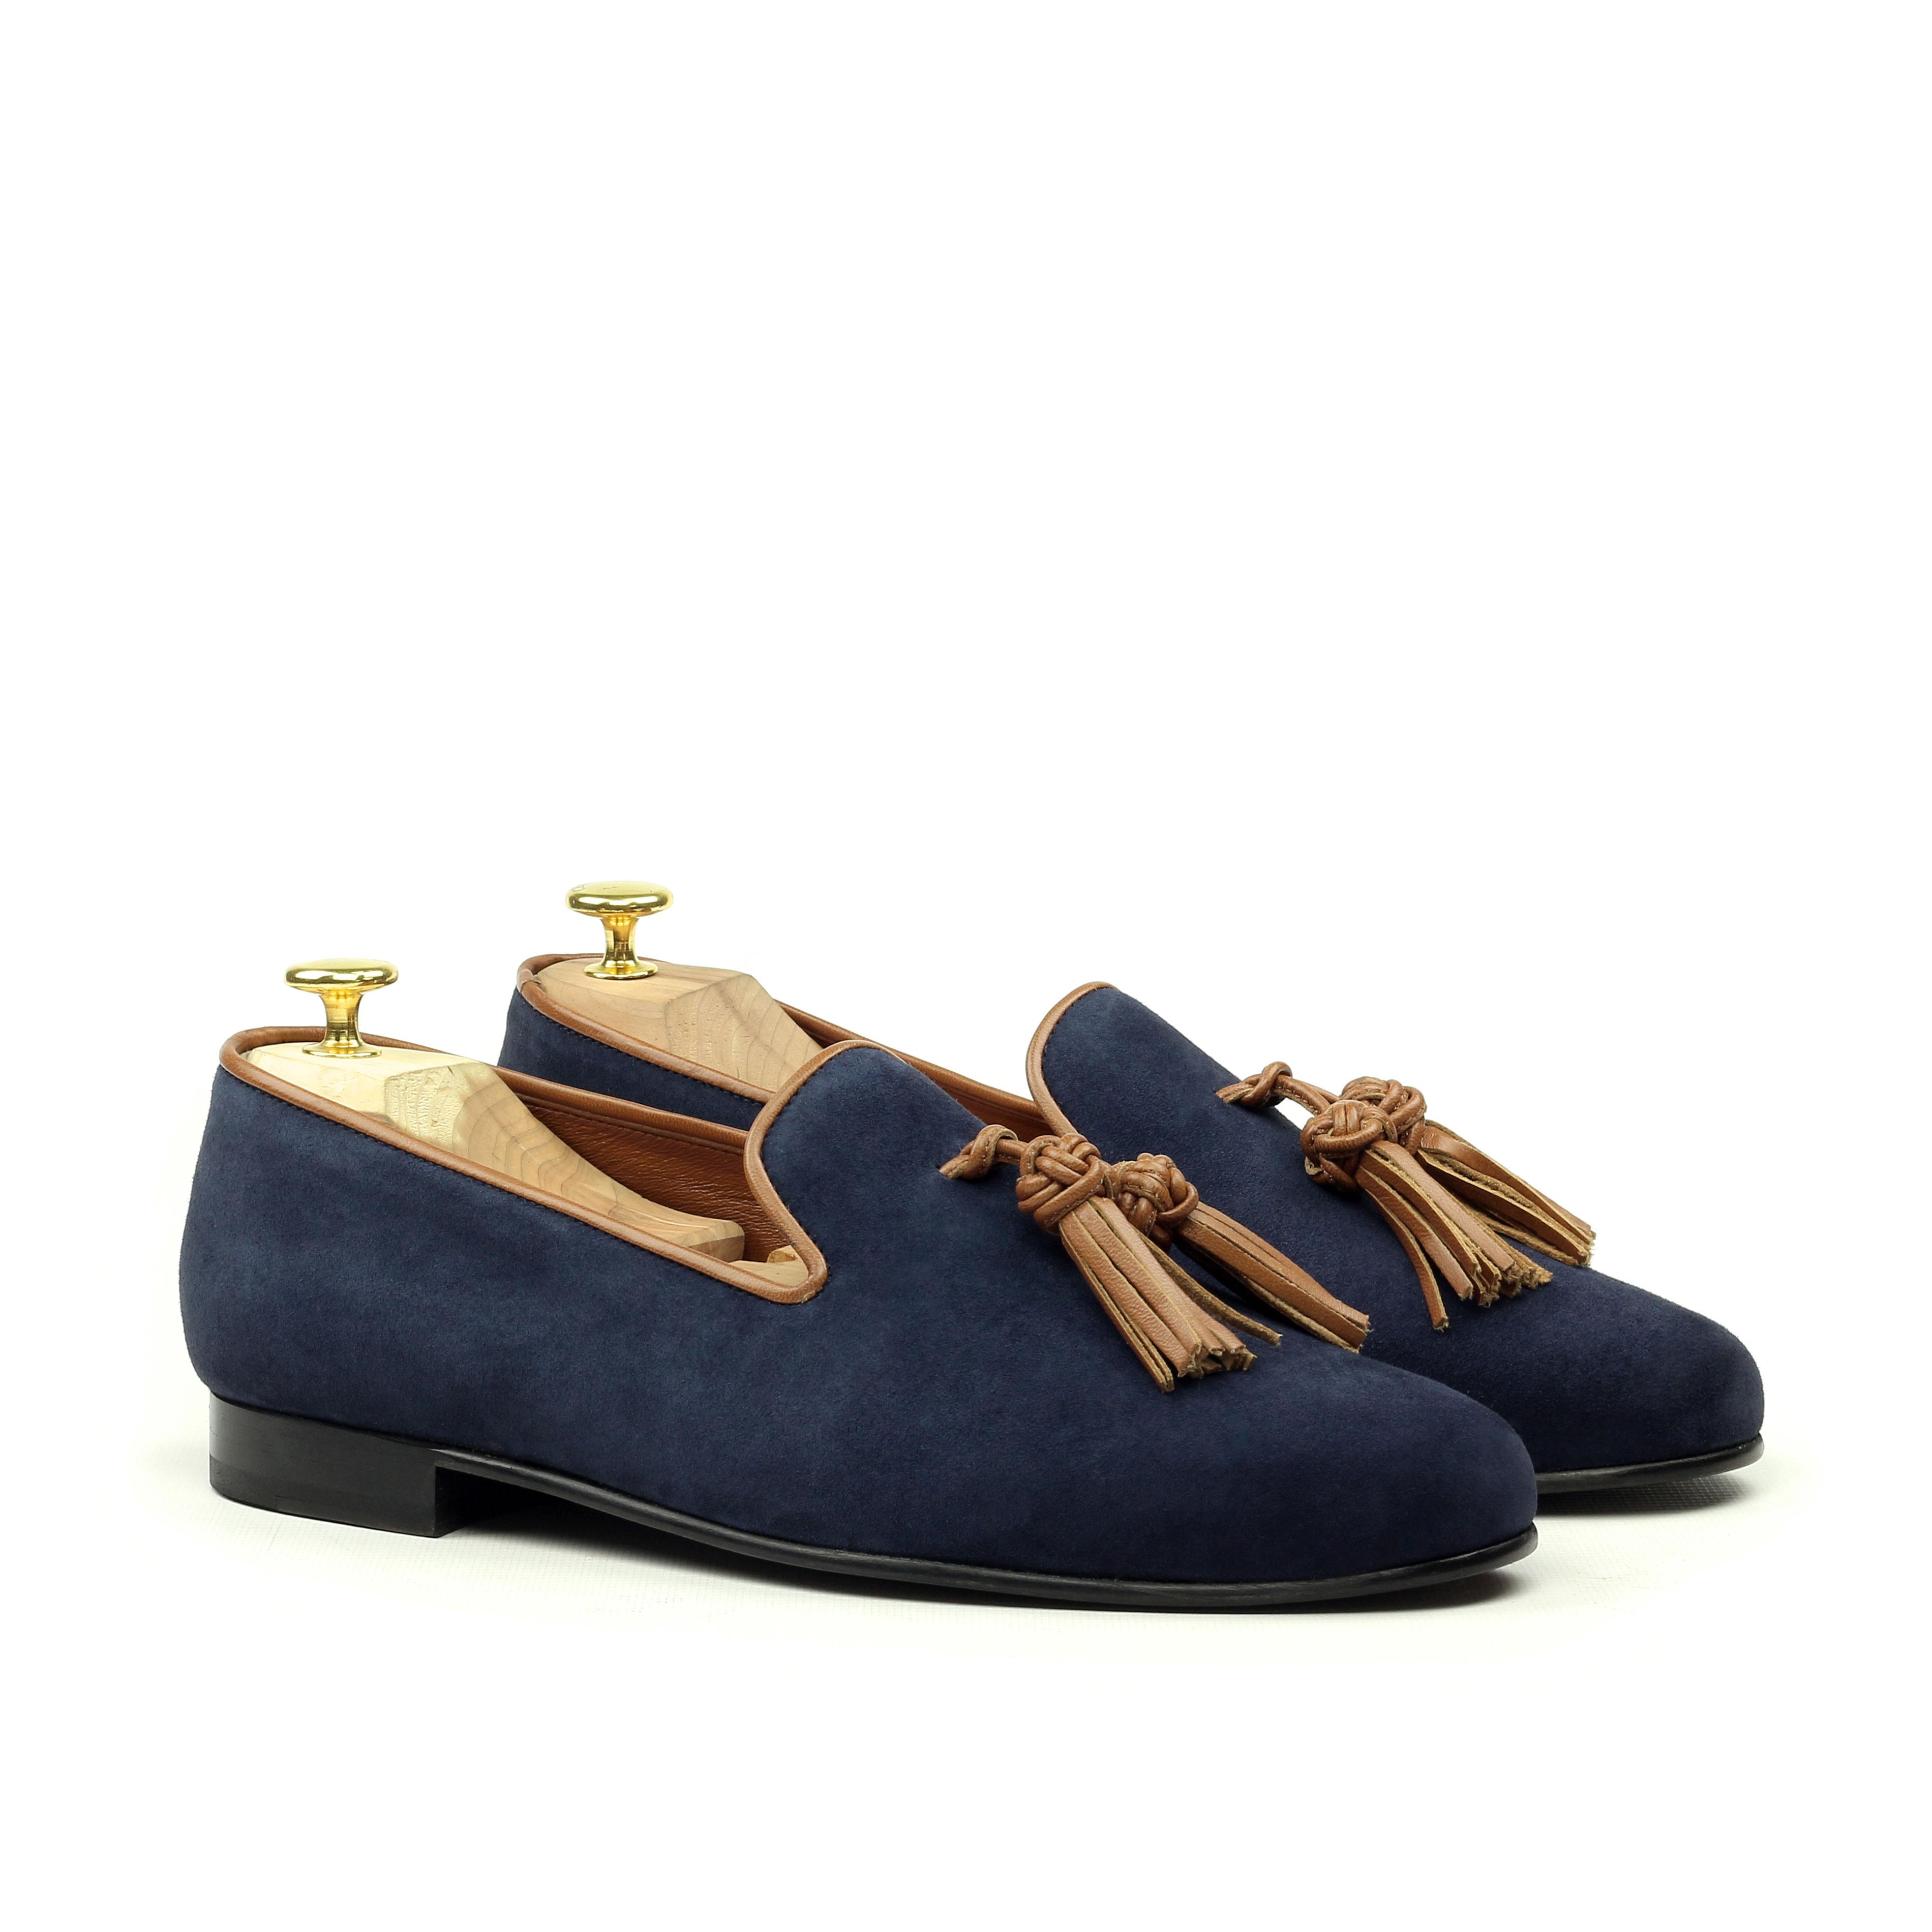 wellington-slipper-navy-suede-special-tassel_5